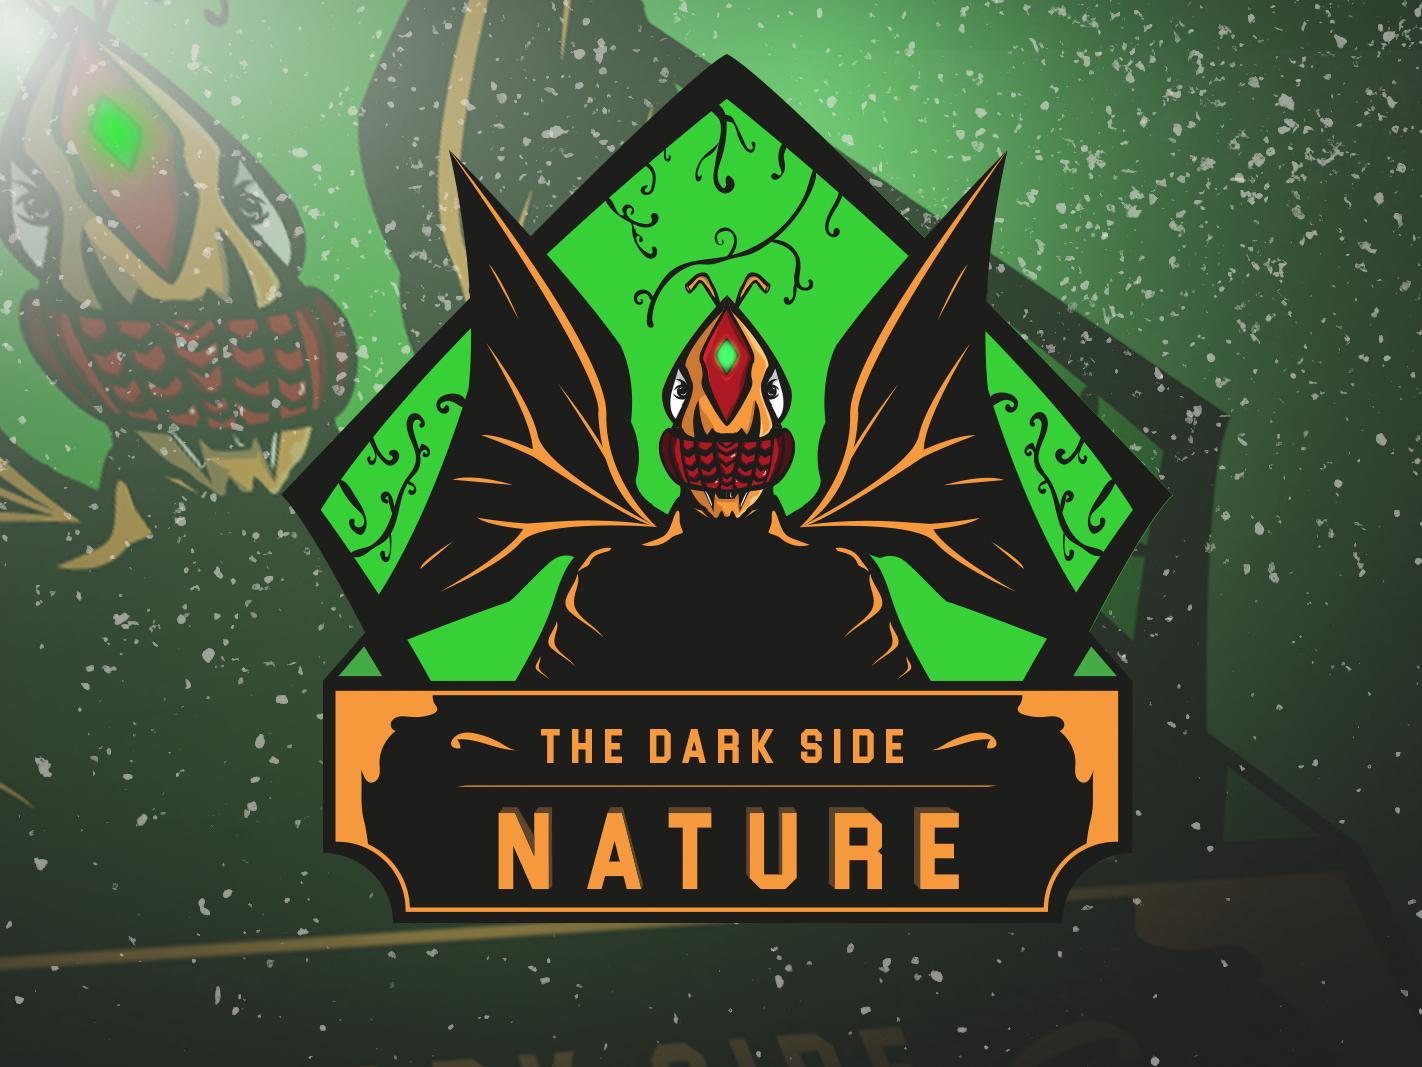 Dark Nature green mascot character dark theme gaming logo mascot logo mascot logodesigner esports logo esportslogo esport logo esport branding twitch sports logo mascotlogo illustration gaminglogo gaming forsale esports